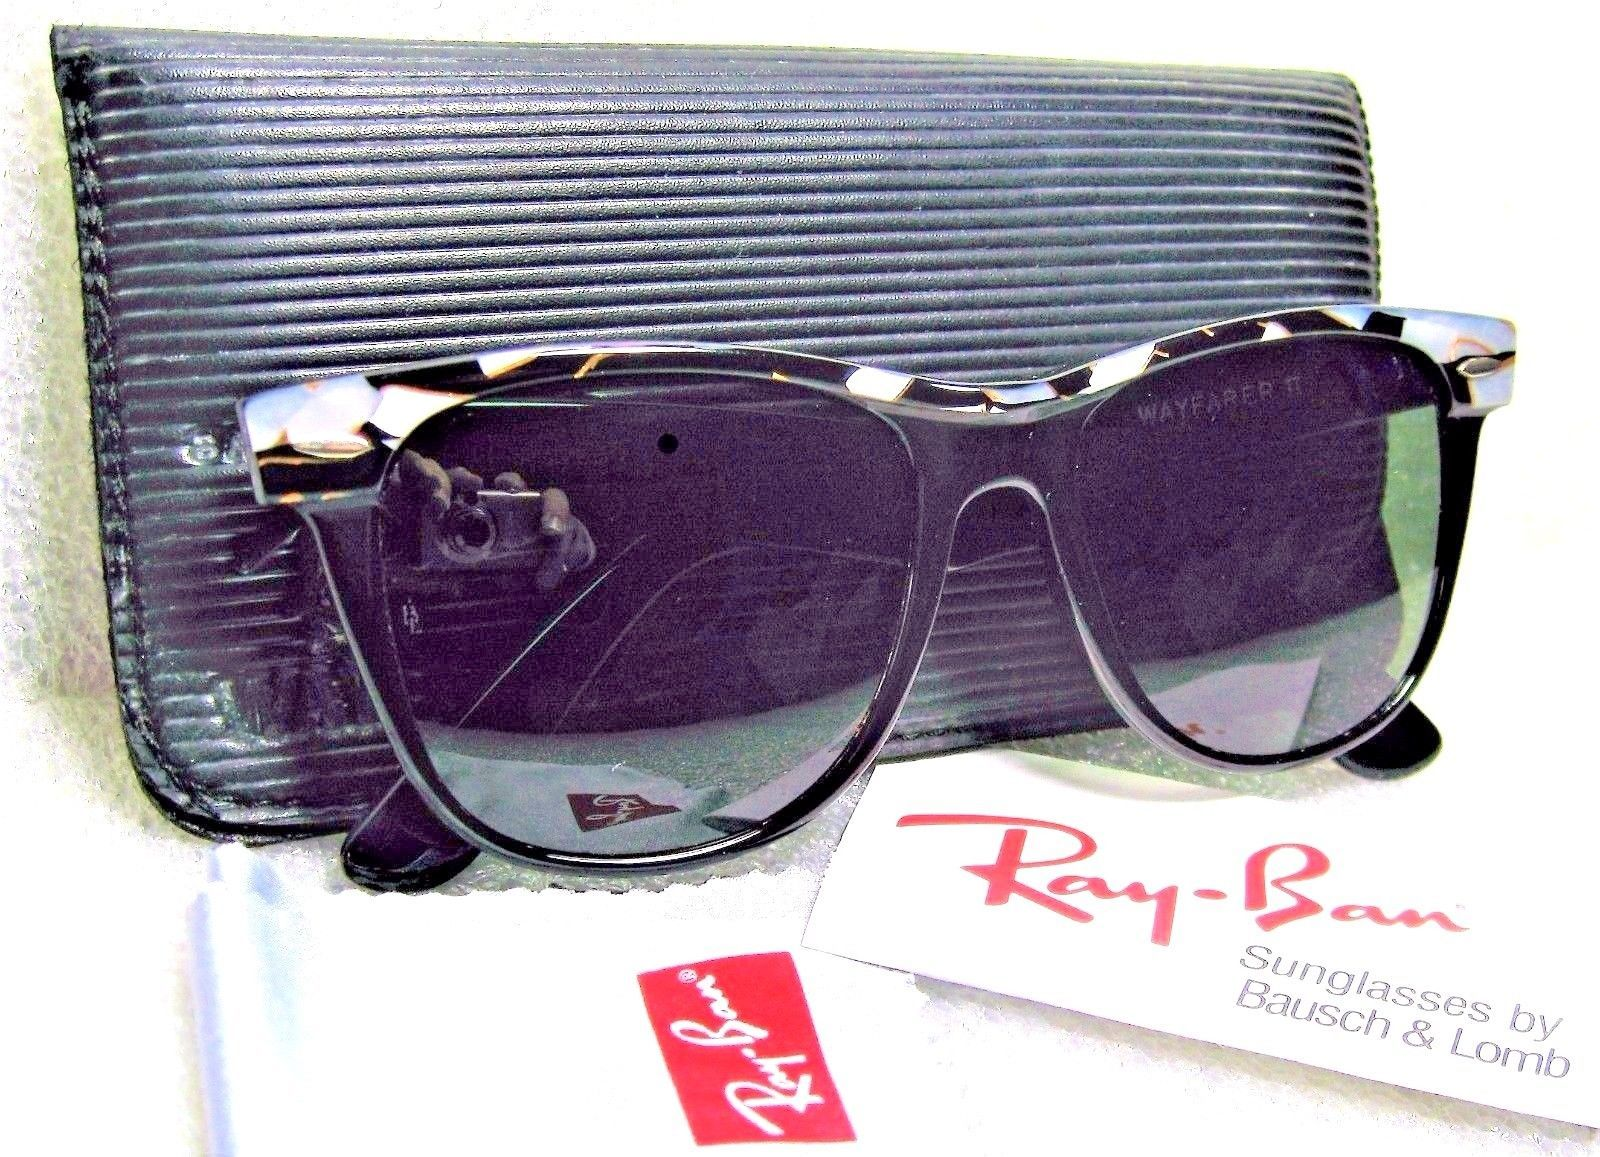 82639da101 Ray-Ban USA NOS Vintage B L Wayfarer II W1089 Street Neat Mosaic New  Sunglasses